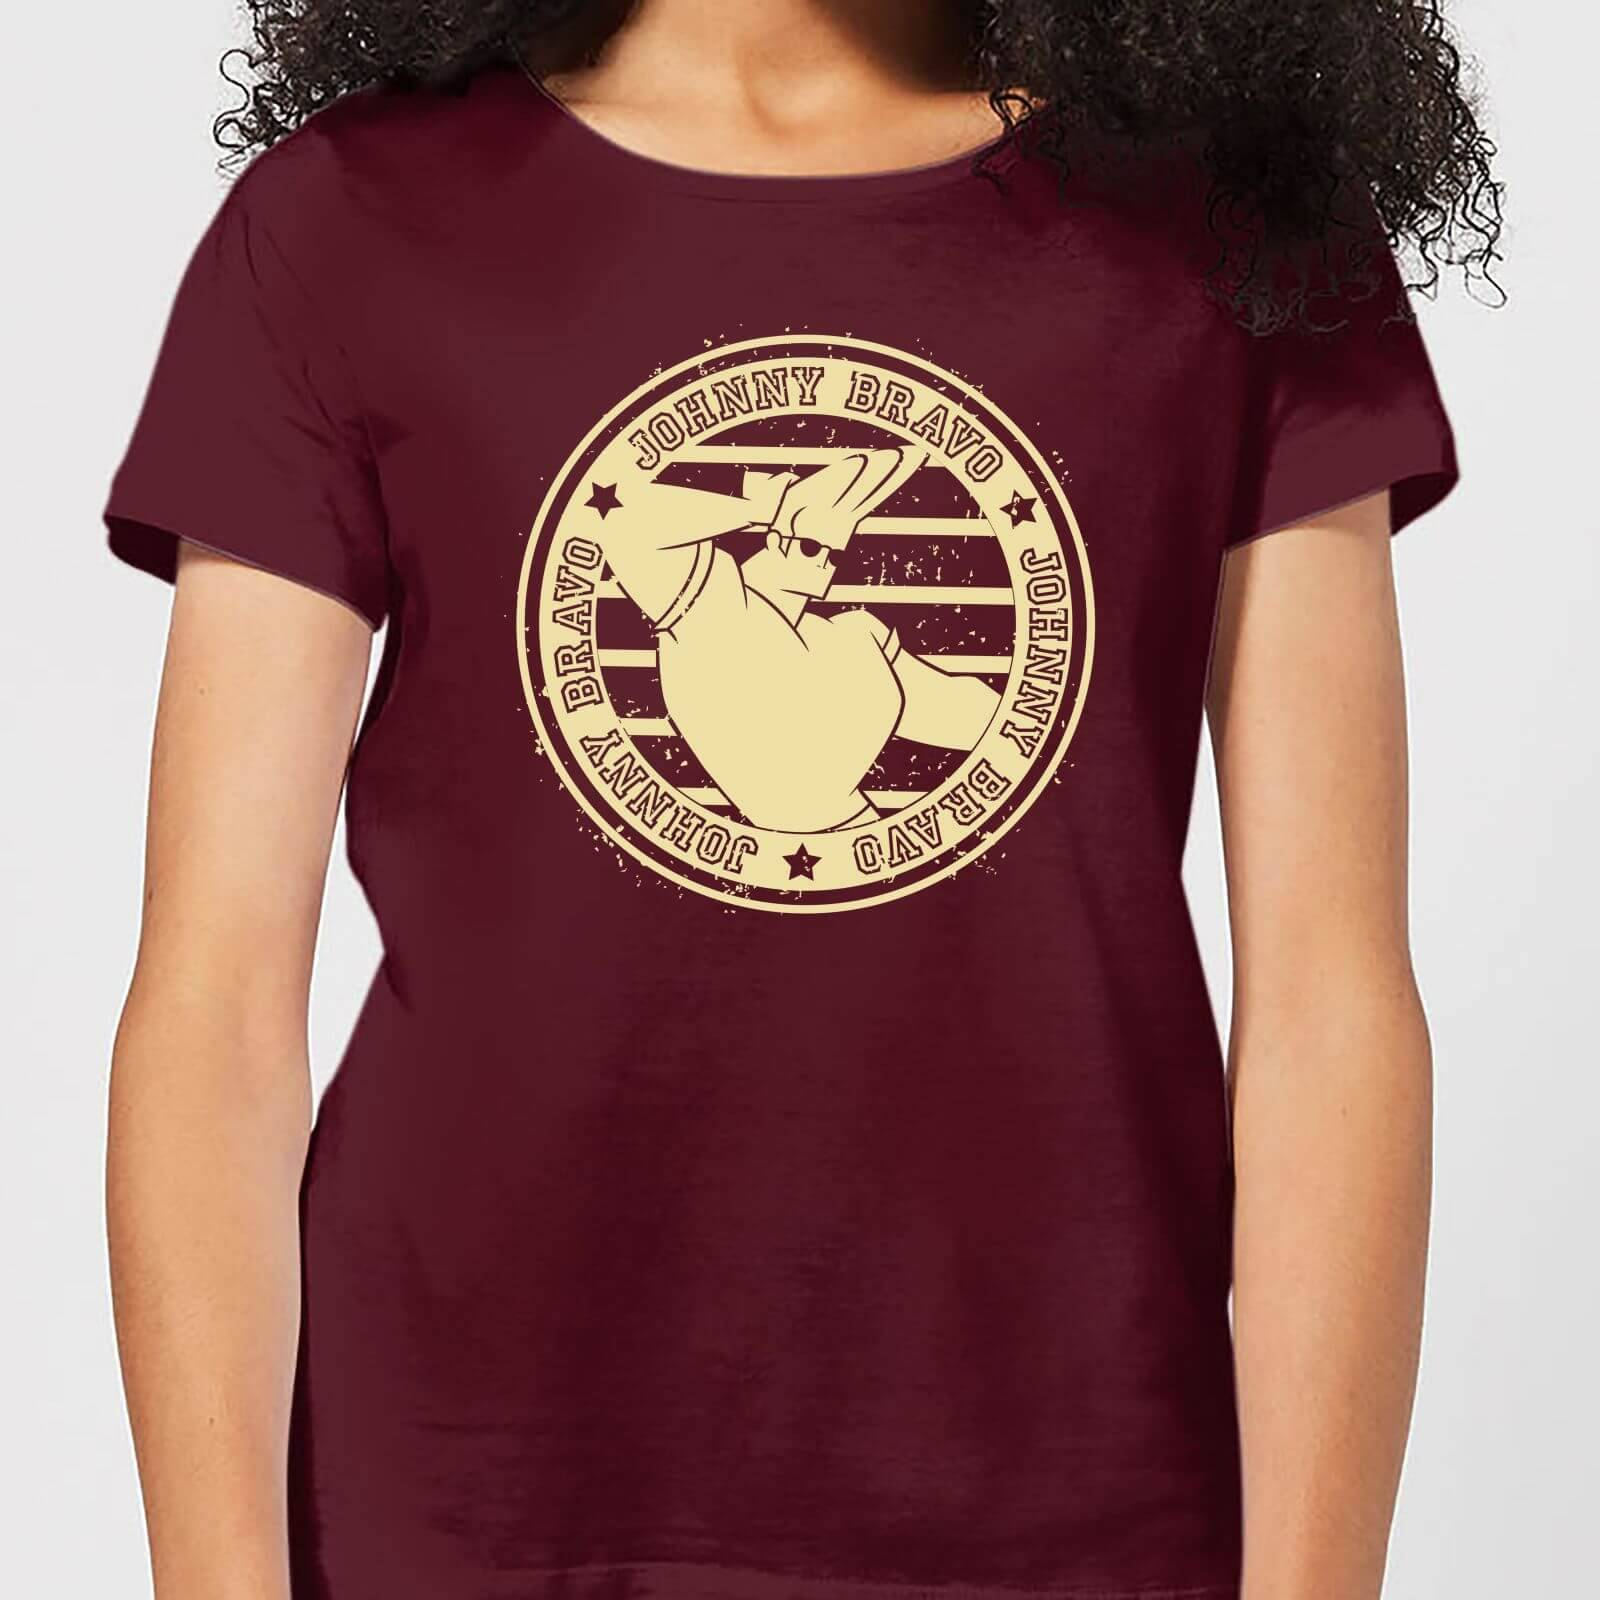 Cartoon Network Johnny Bravo Sports Badge Women's T-Shirt - Burgundy - L - Burgundy